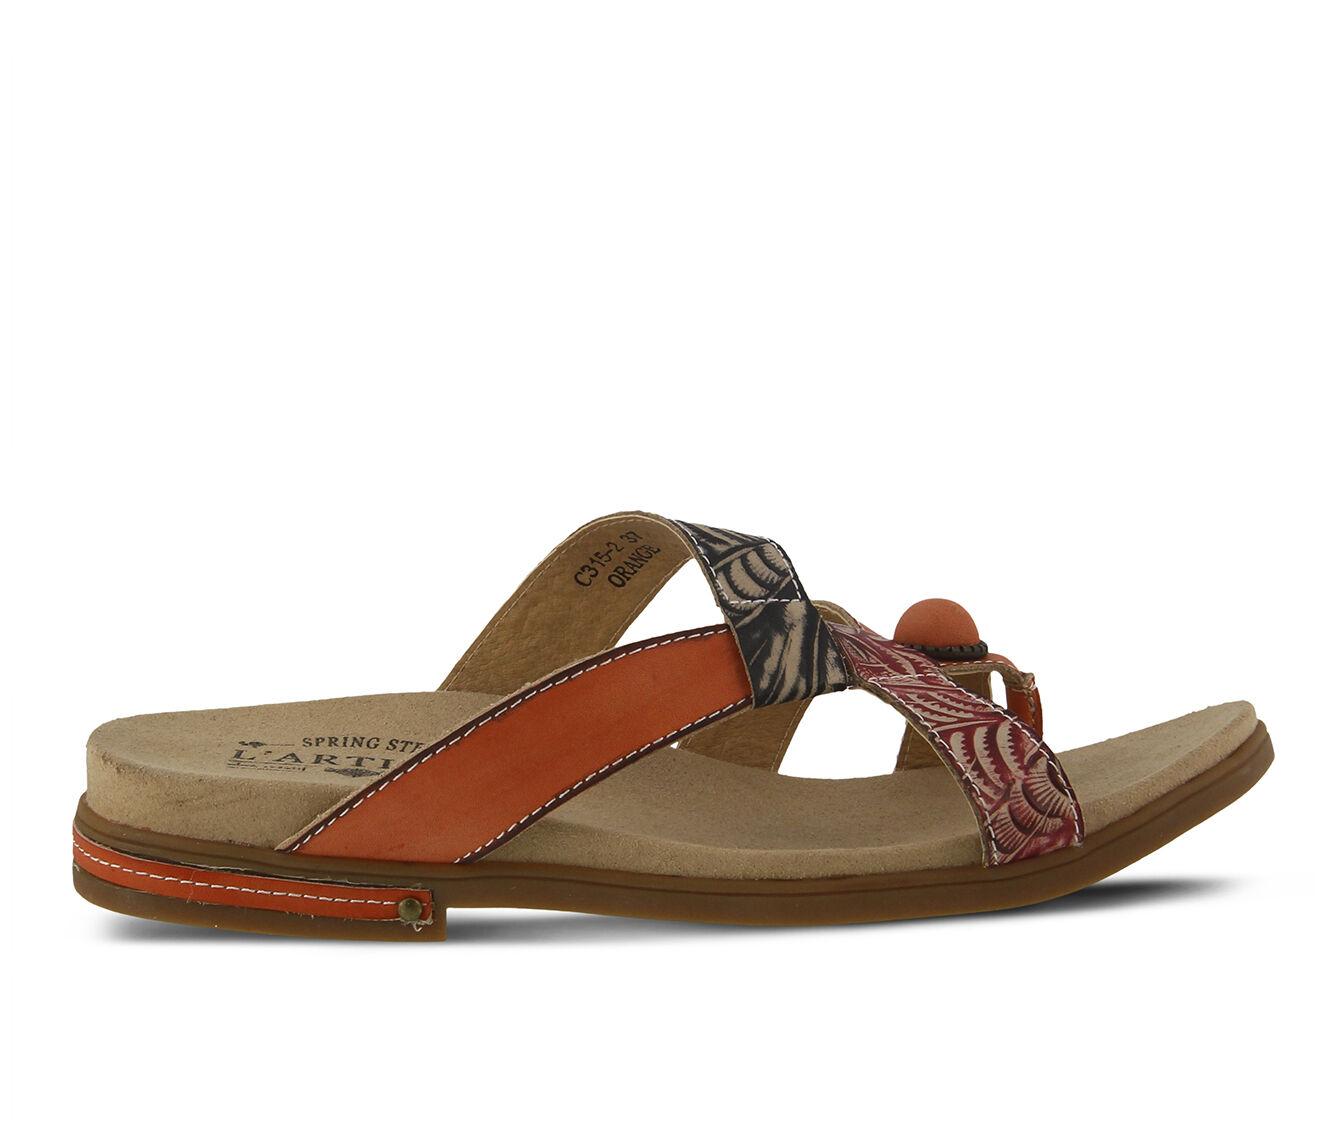 Delicate styles Women's L'ARTISTE Pierce Sandals Peach Multi